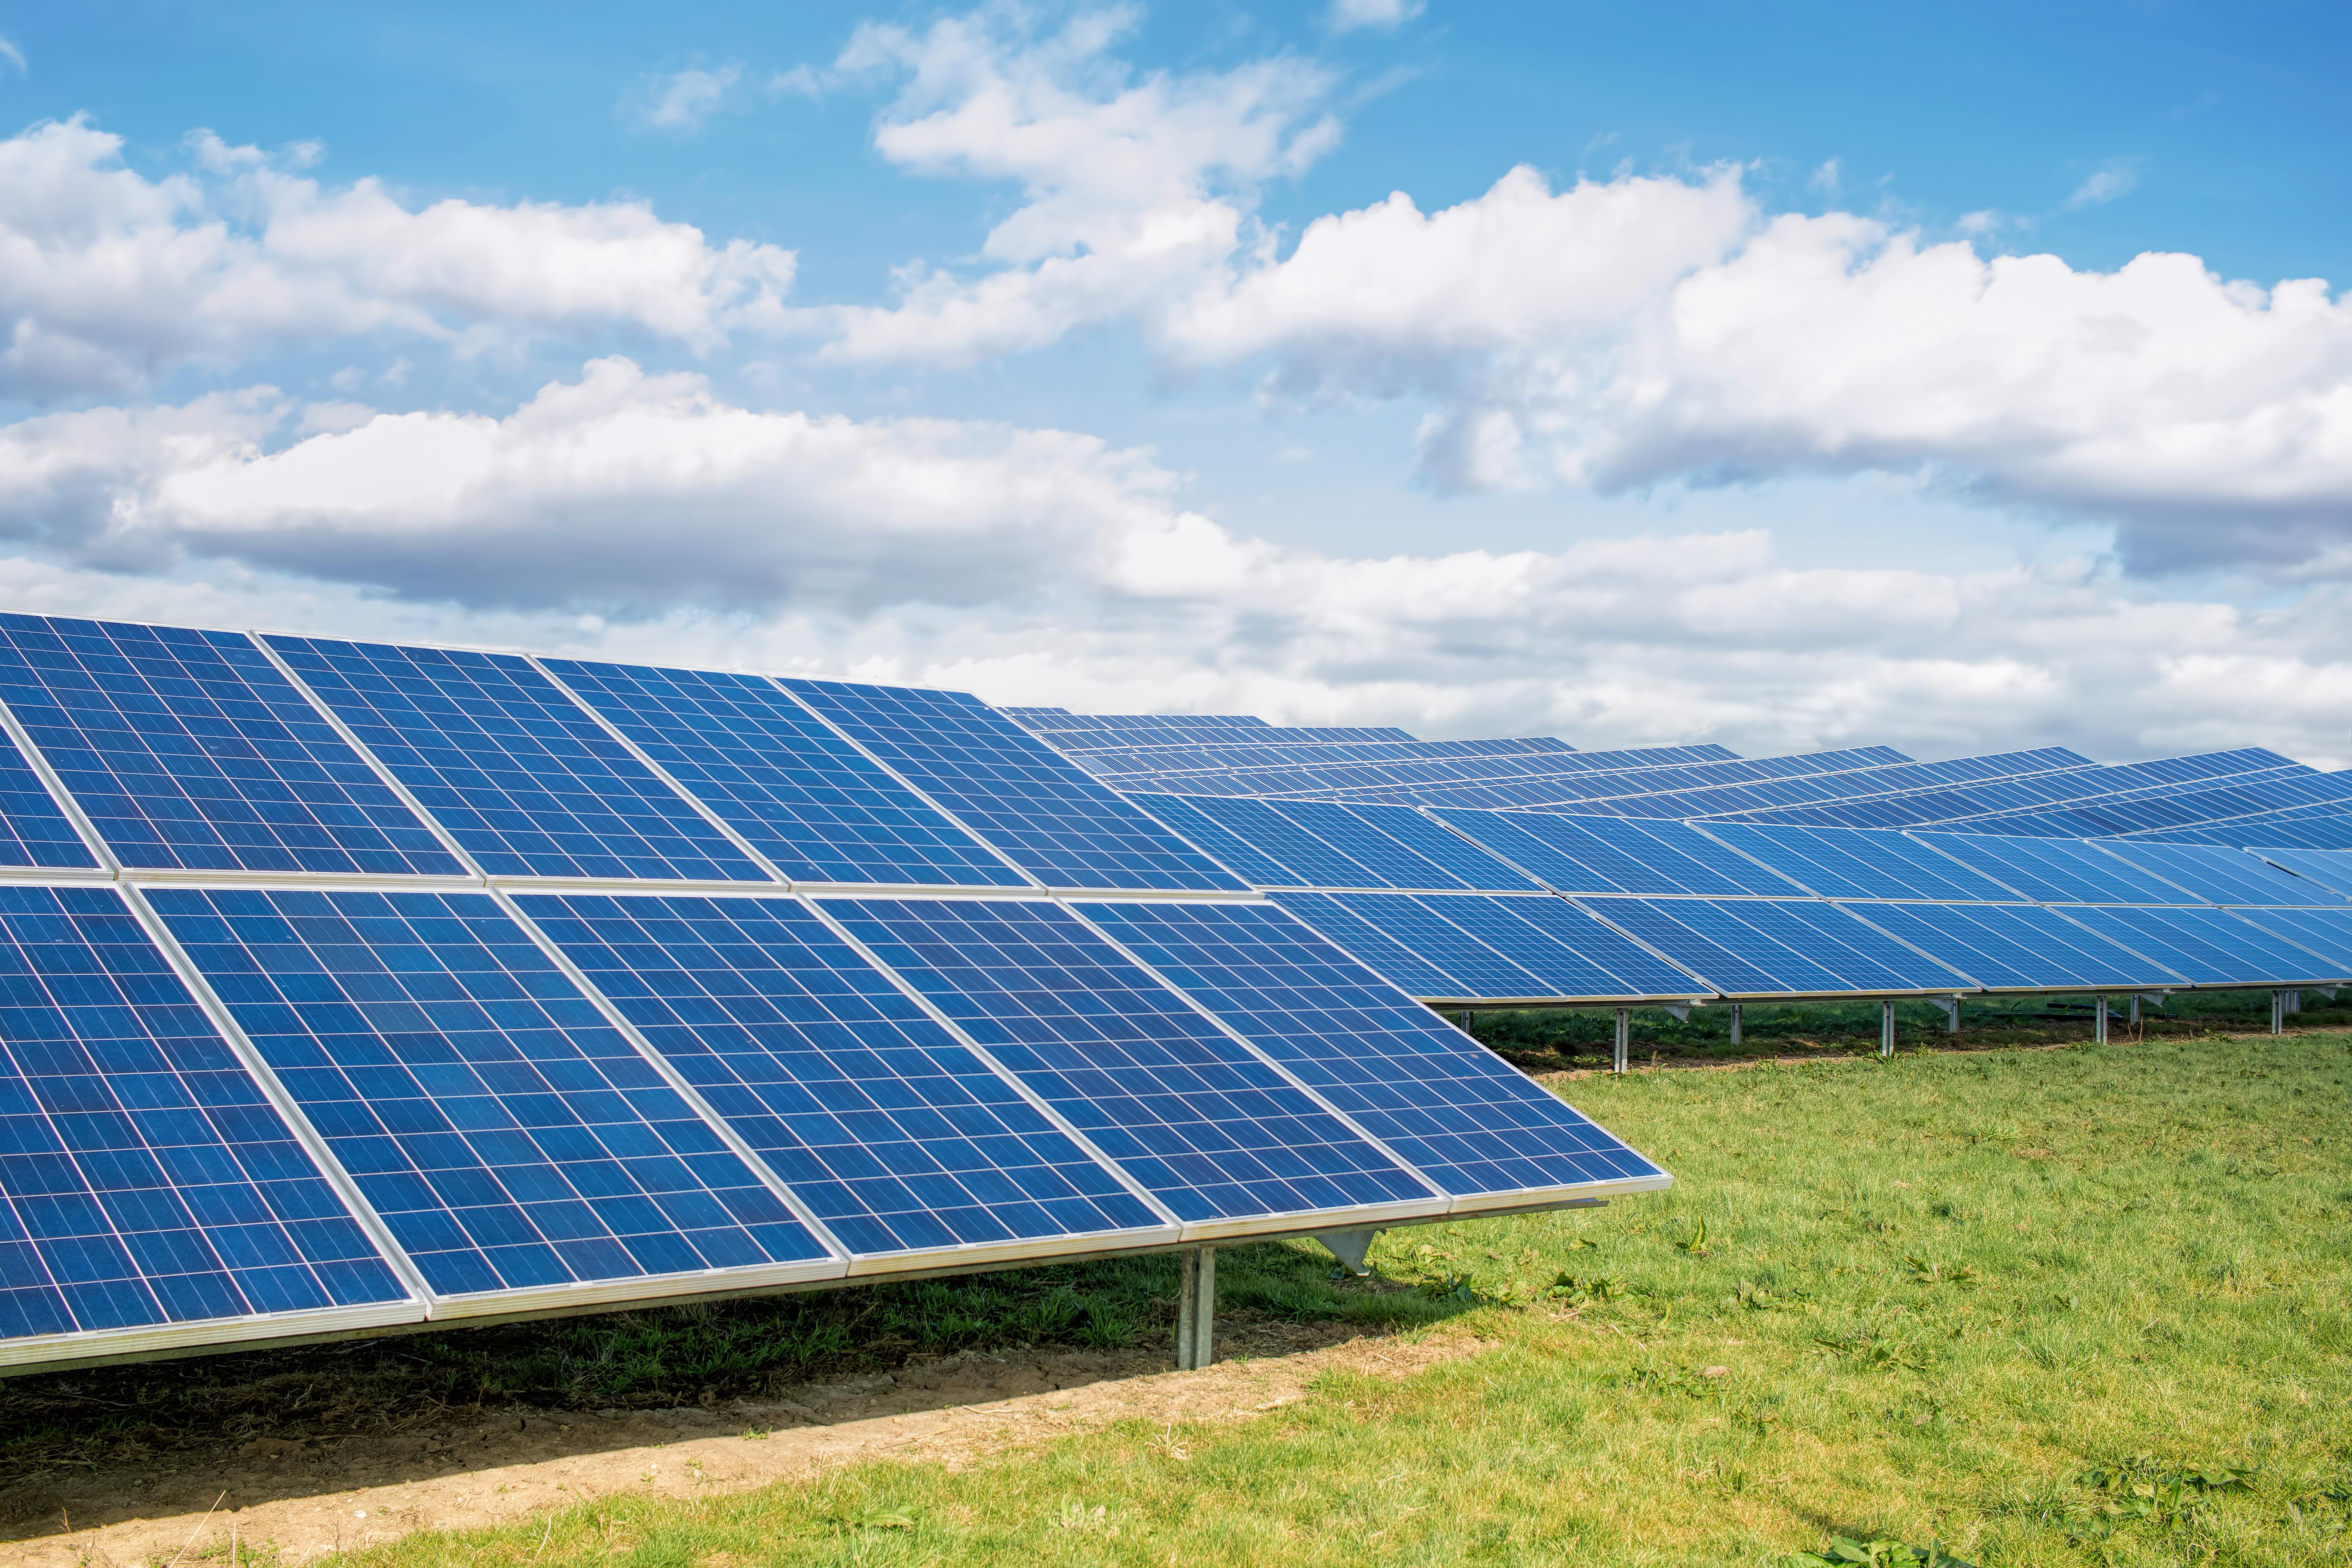 Utility scale solar installation.